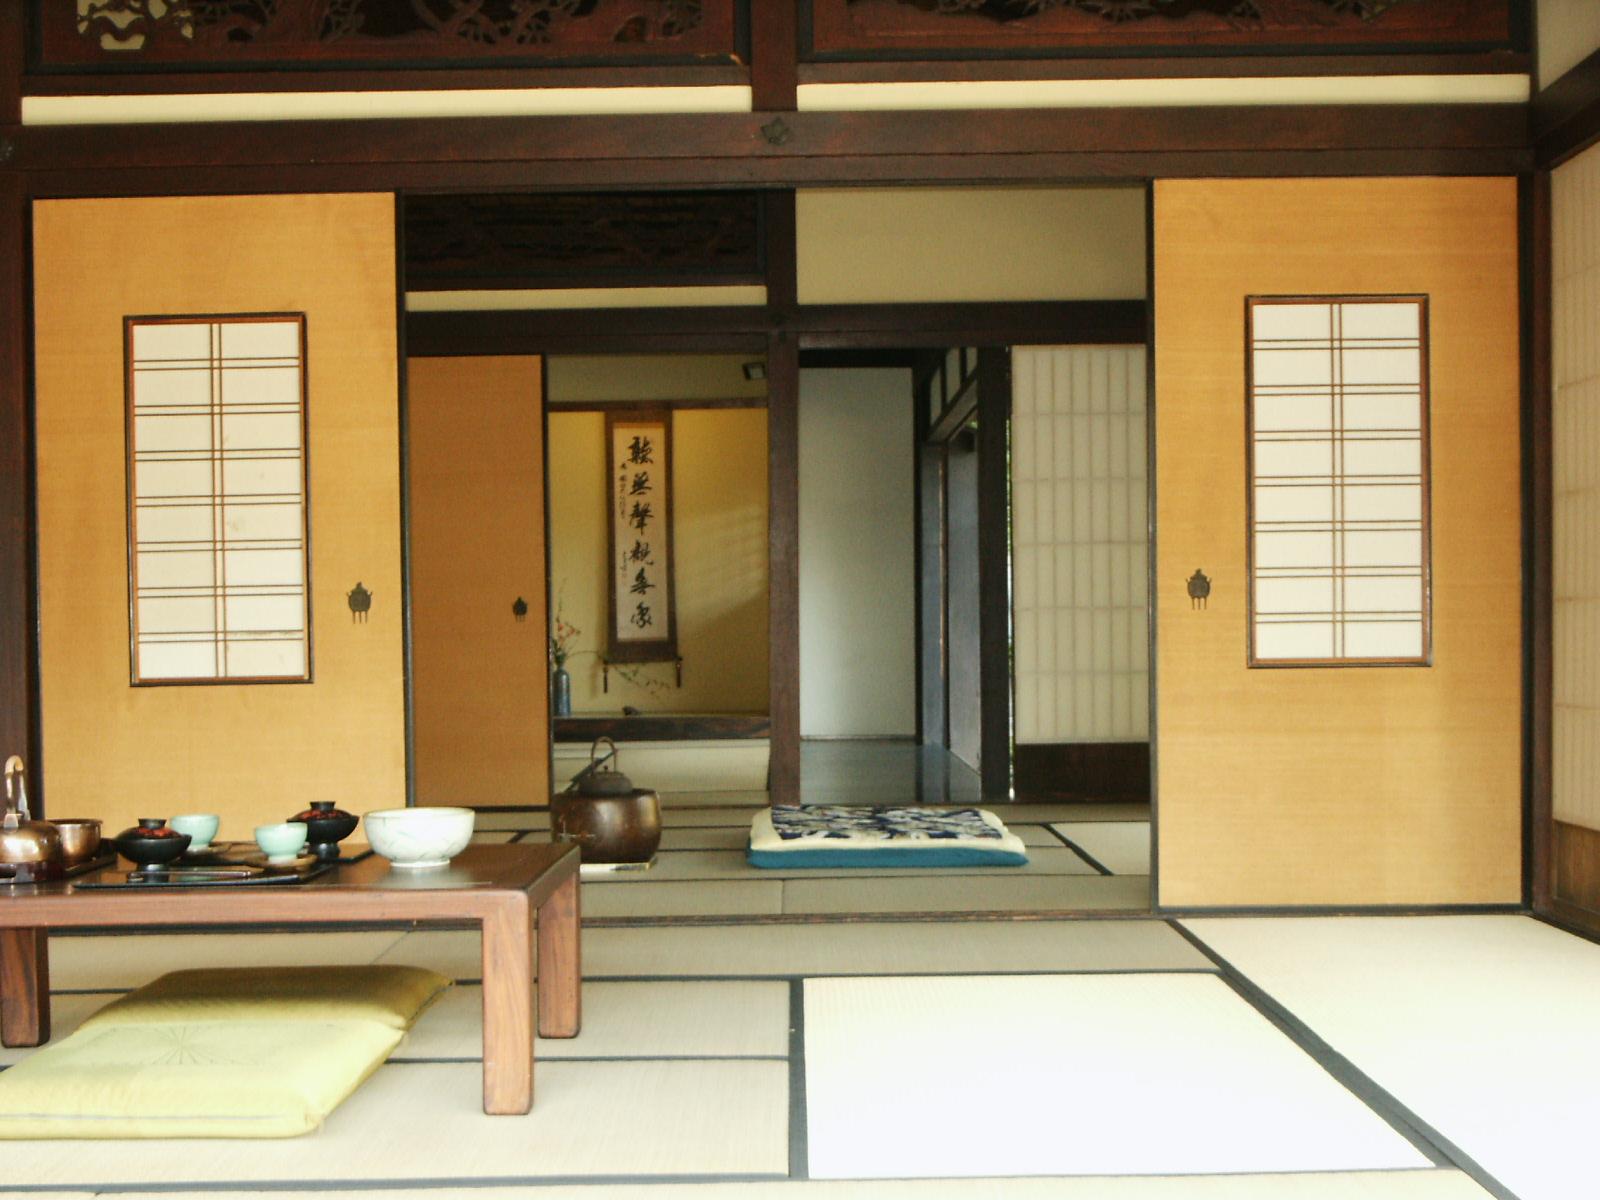 unusual airbnb tokyo teahouse interior